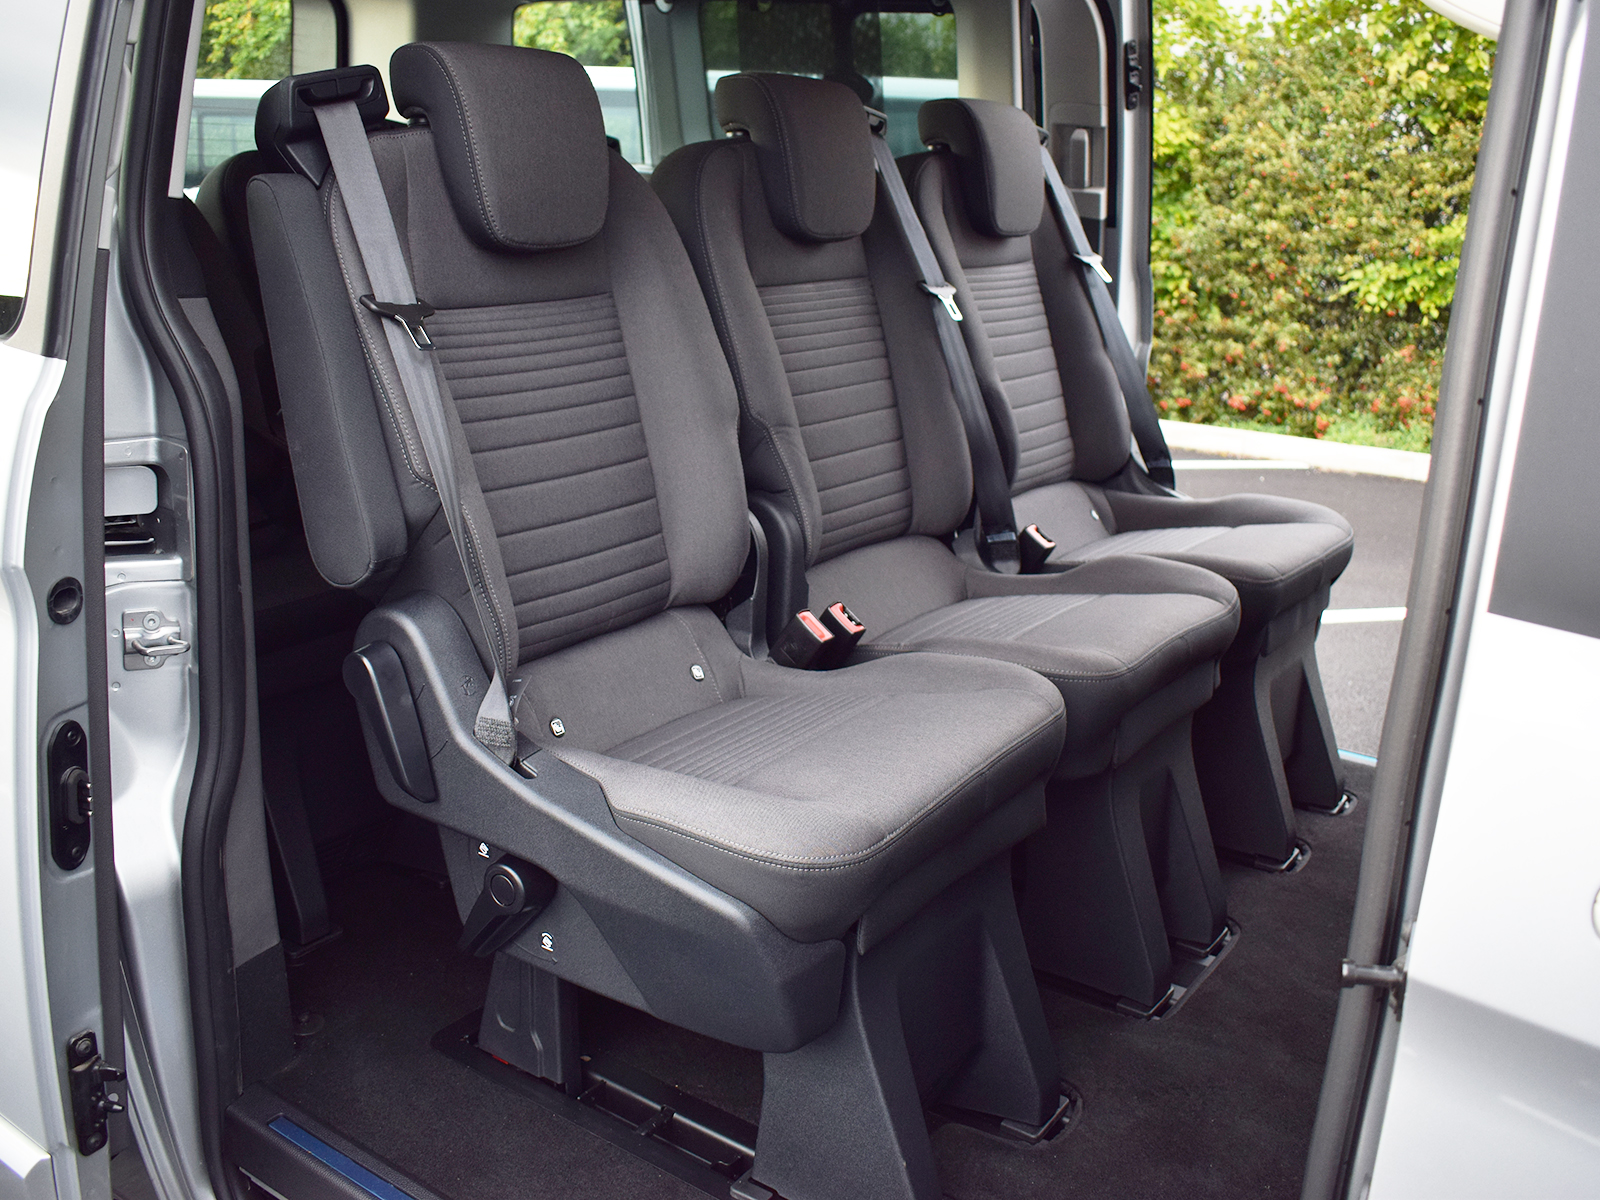 Details about Genuine OEM Folding Triple Rear Seats incl Belts Fixings for  Ford Transit Custom